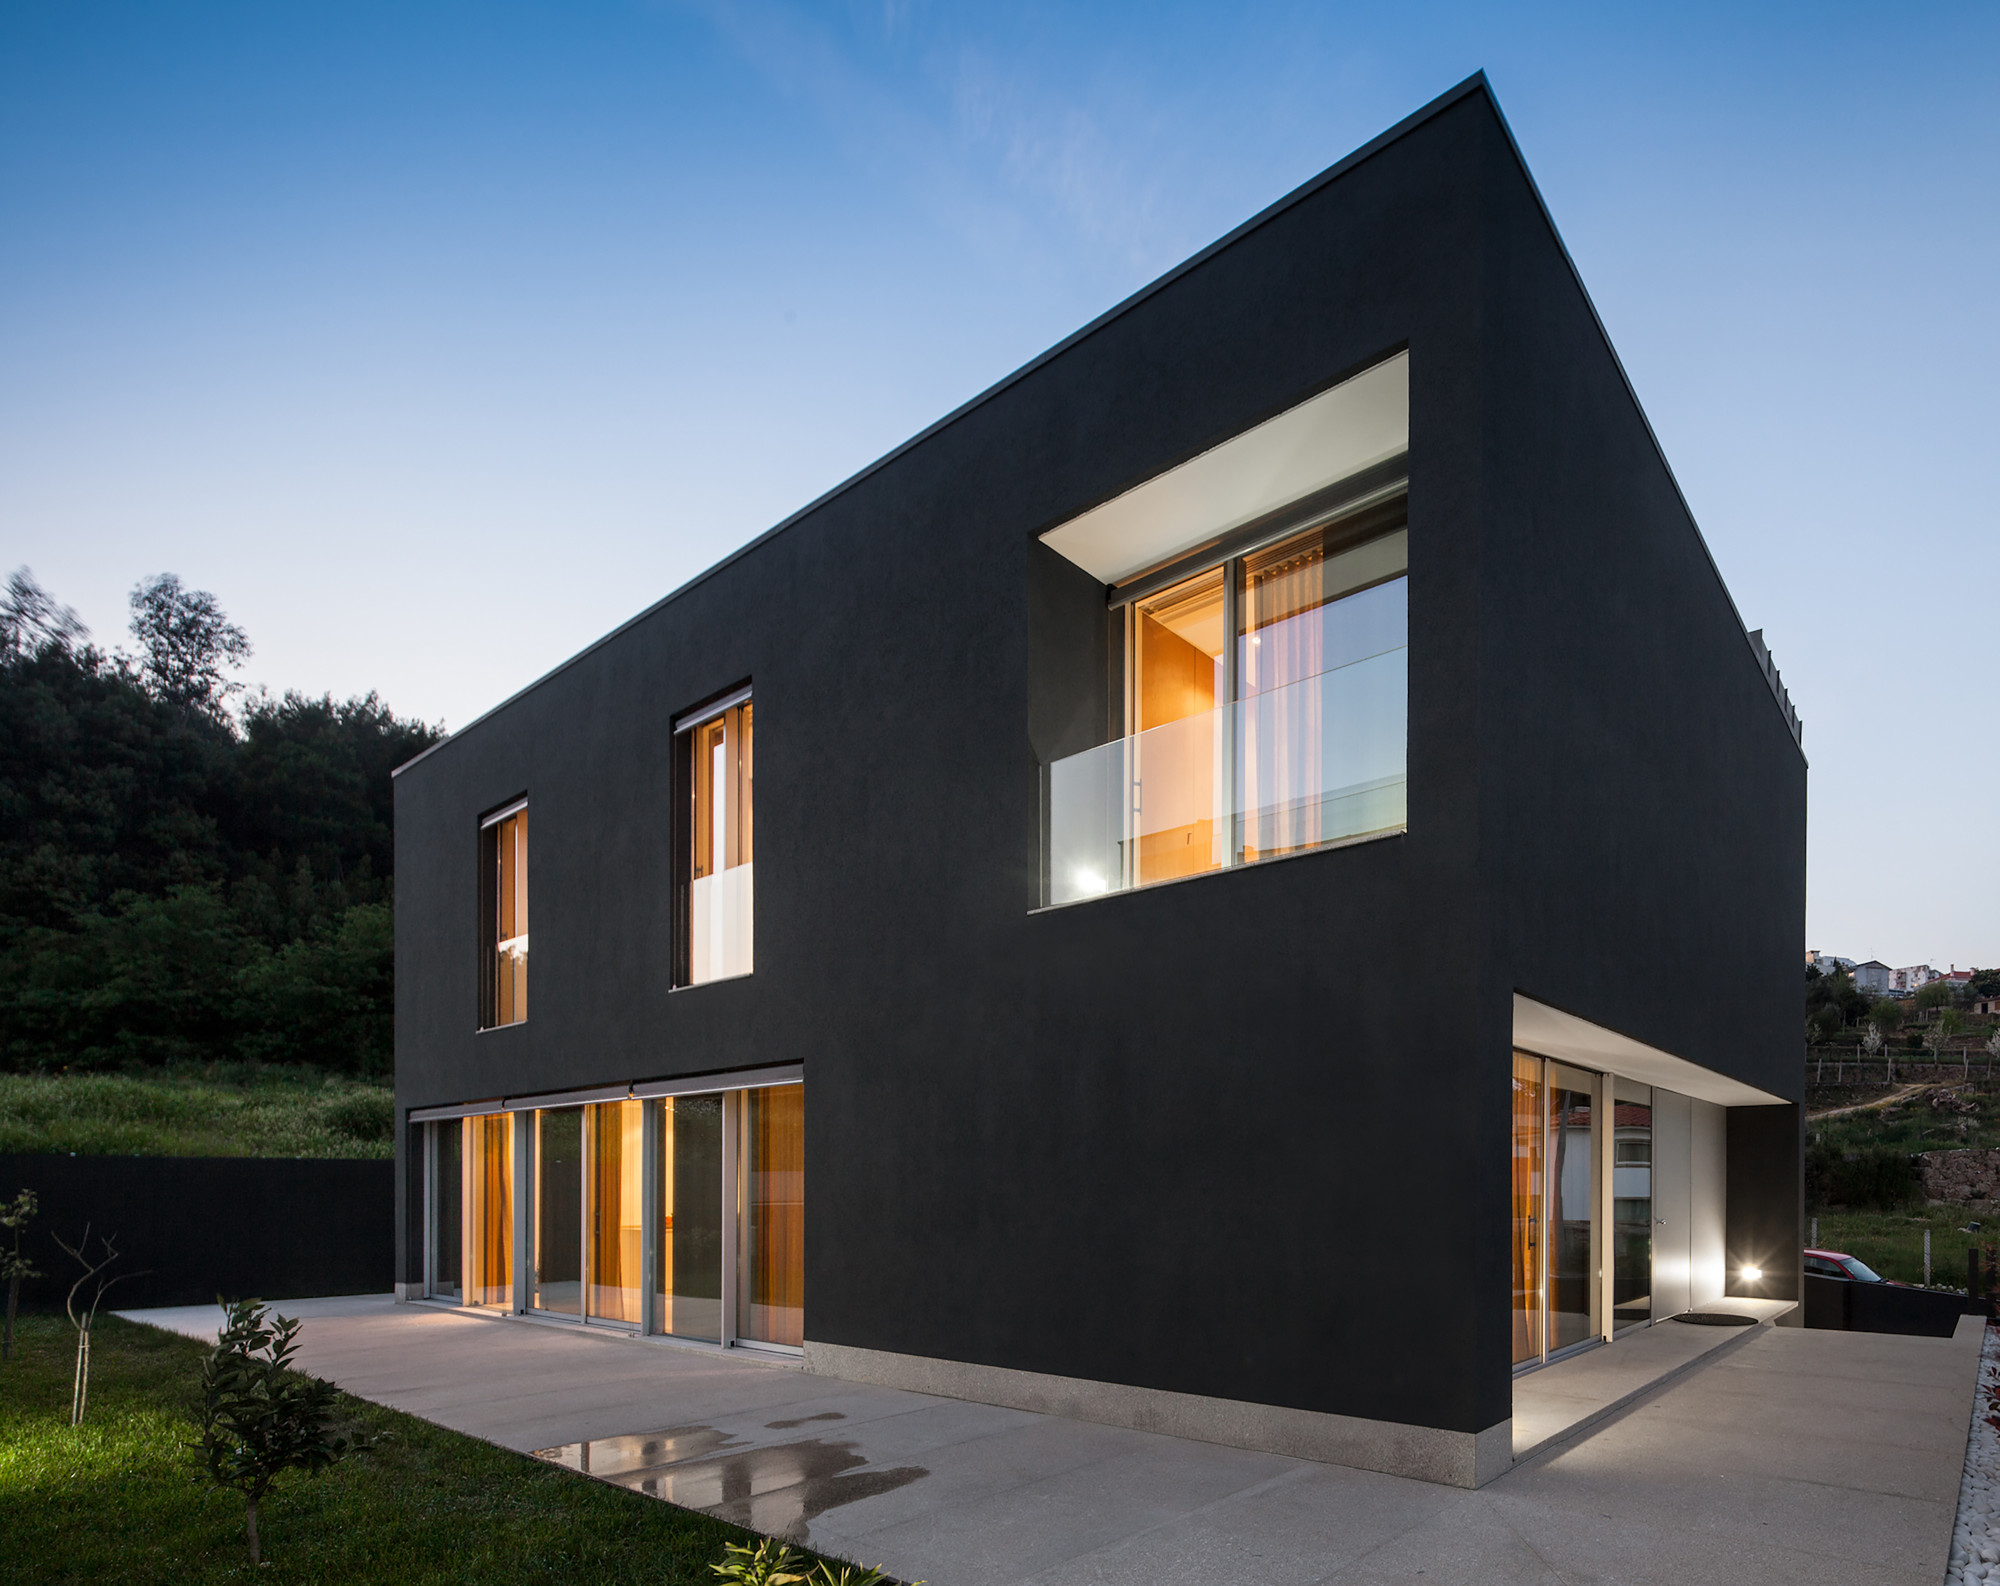 Building At Mountain Top Design Award